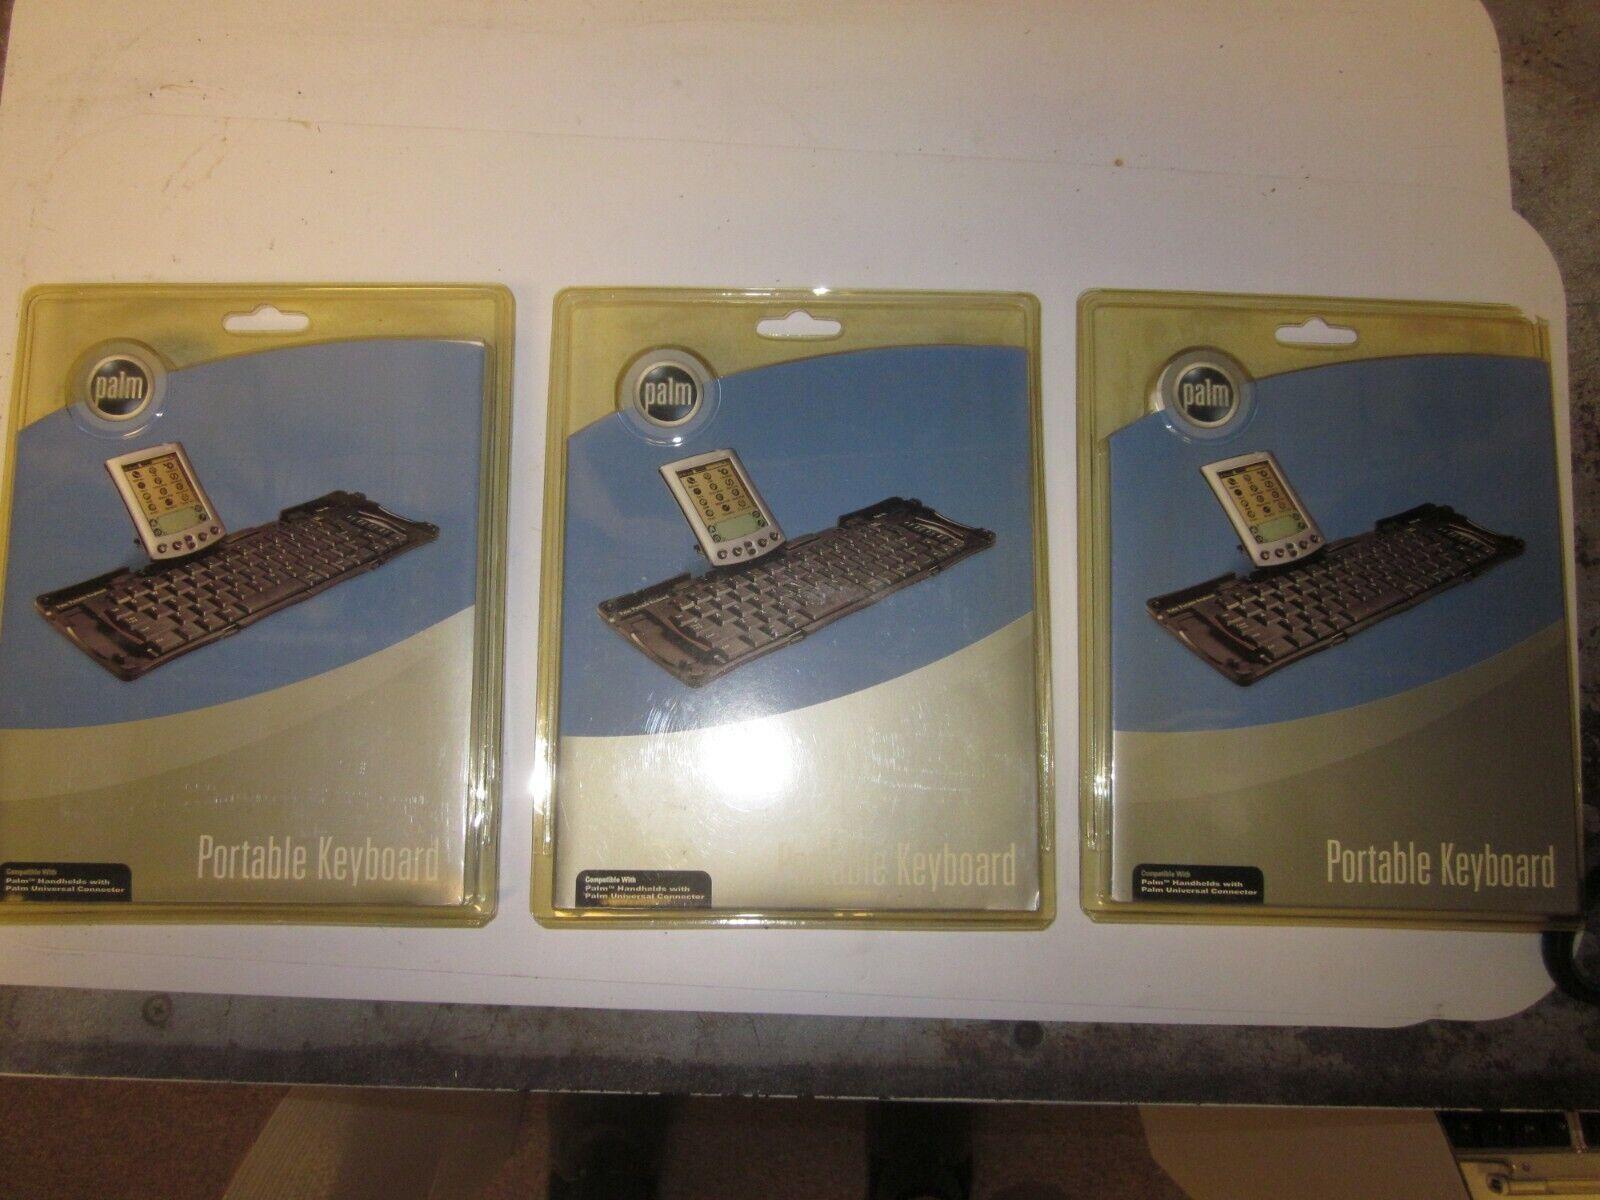 3 Original PALM Pilot Portable Foldable Keyboard, P10802U - $8.99